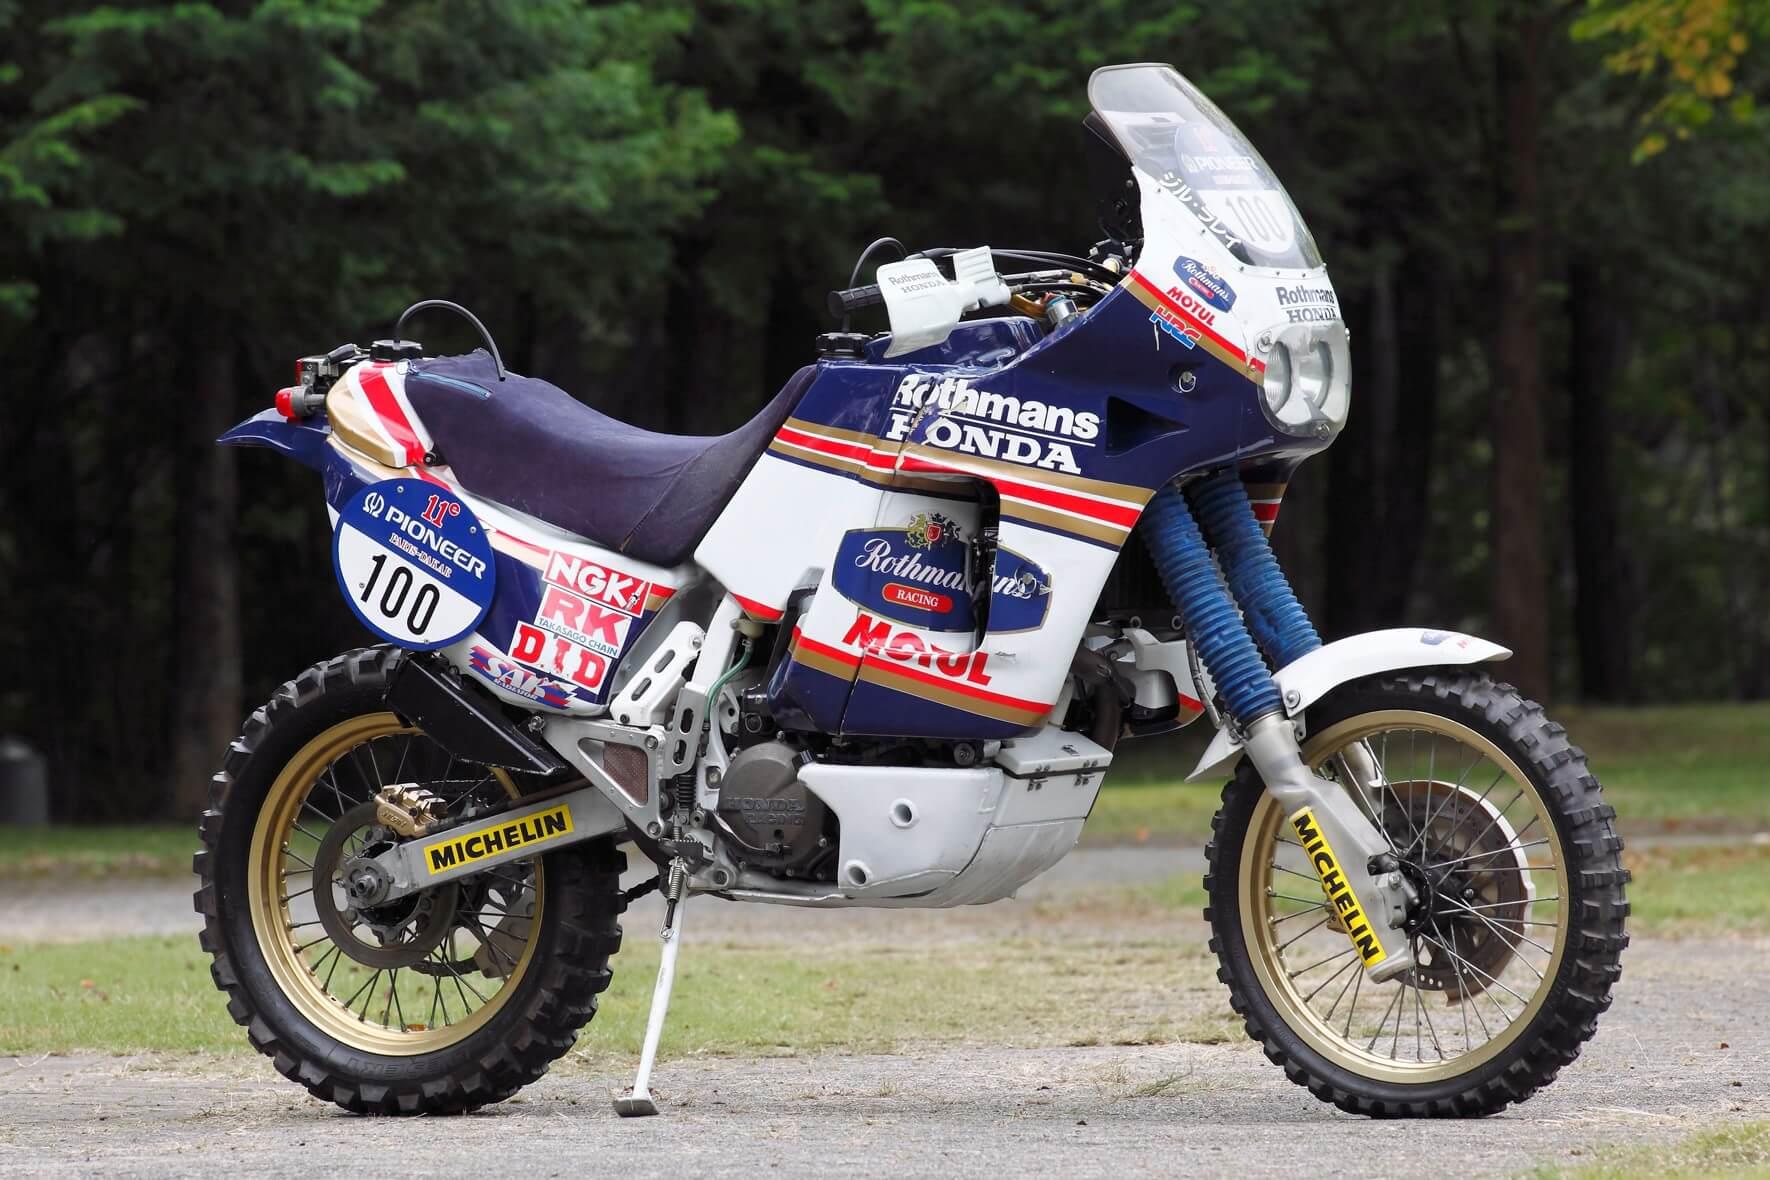 Honda NXR750 Dakar Africa Twin